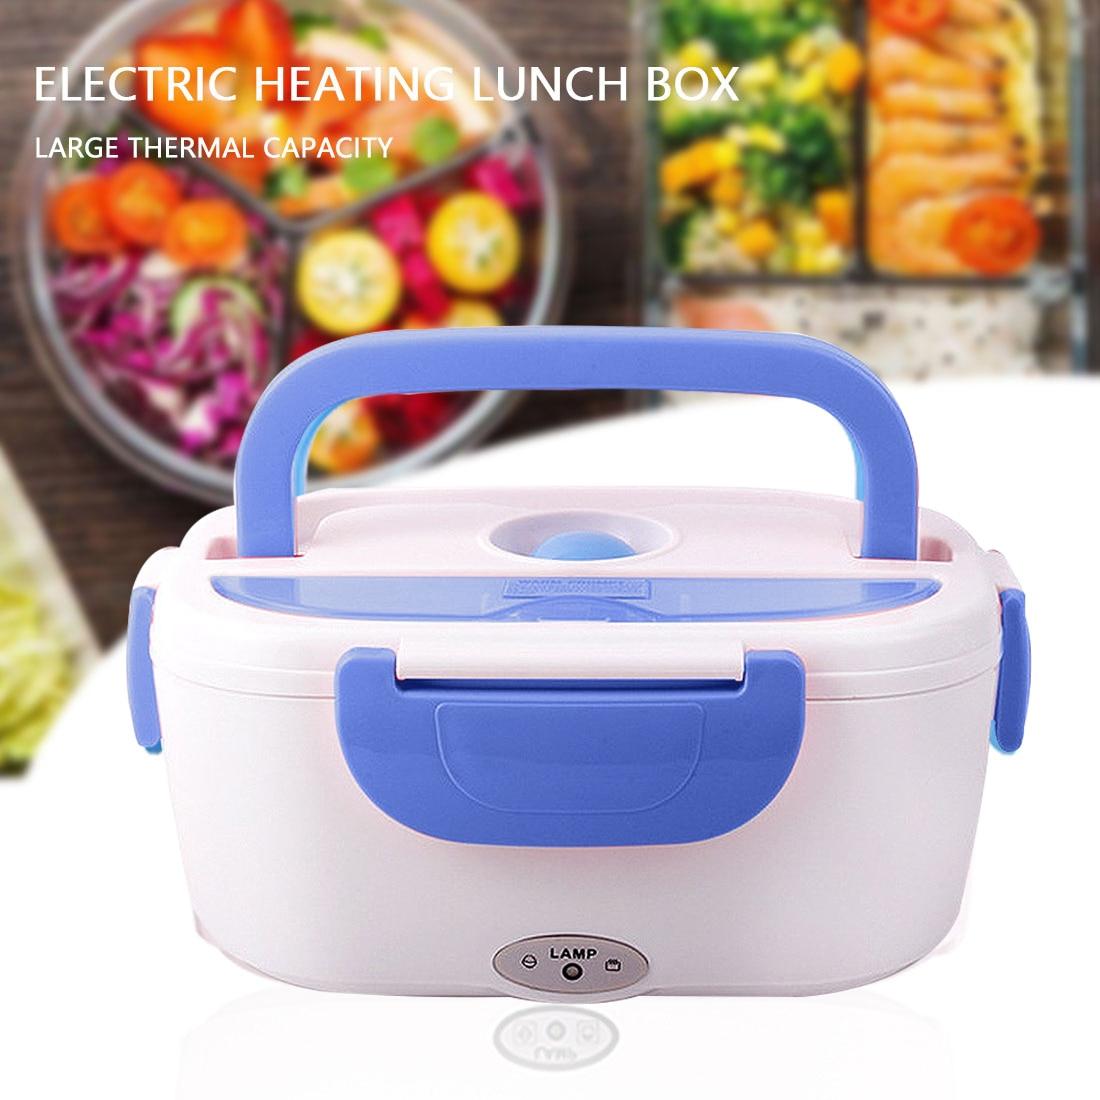 12V 24V 110V 220V Tragbare Elektrische Lunch Box Edelstahl Auto Home Office Heizung Bento Box kinder Lebensmittel Wärmer Container